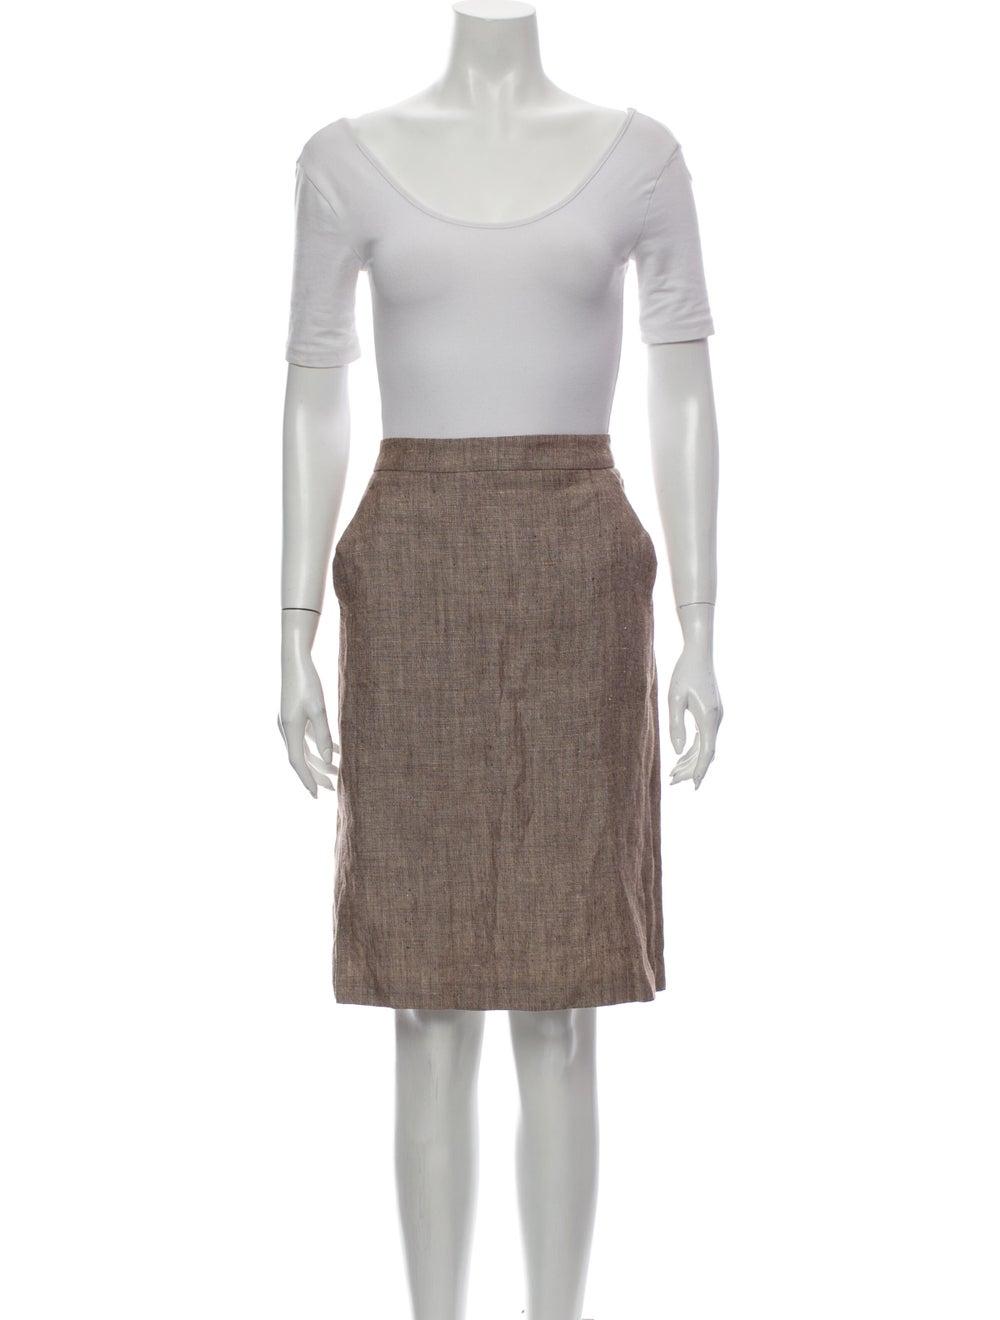 Burberry London Linen Skirt Suit - image 4